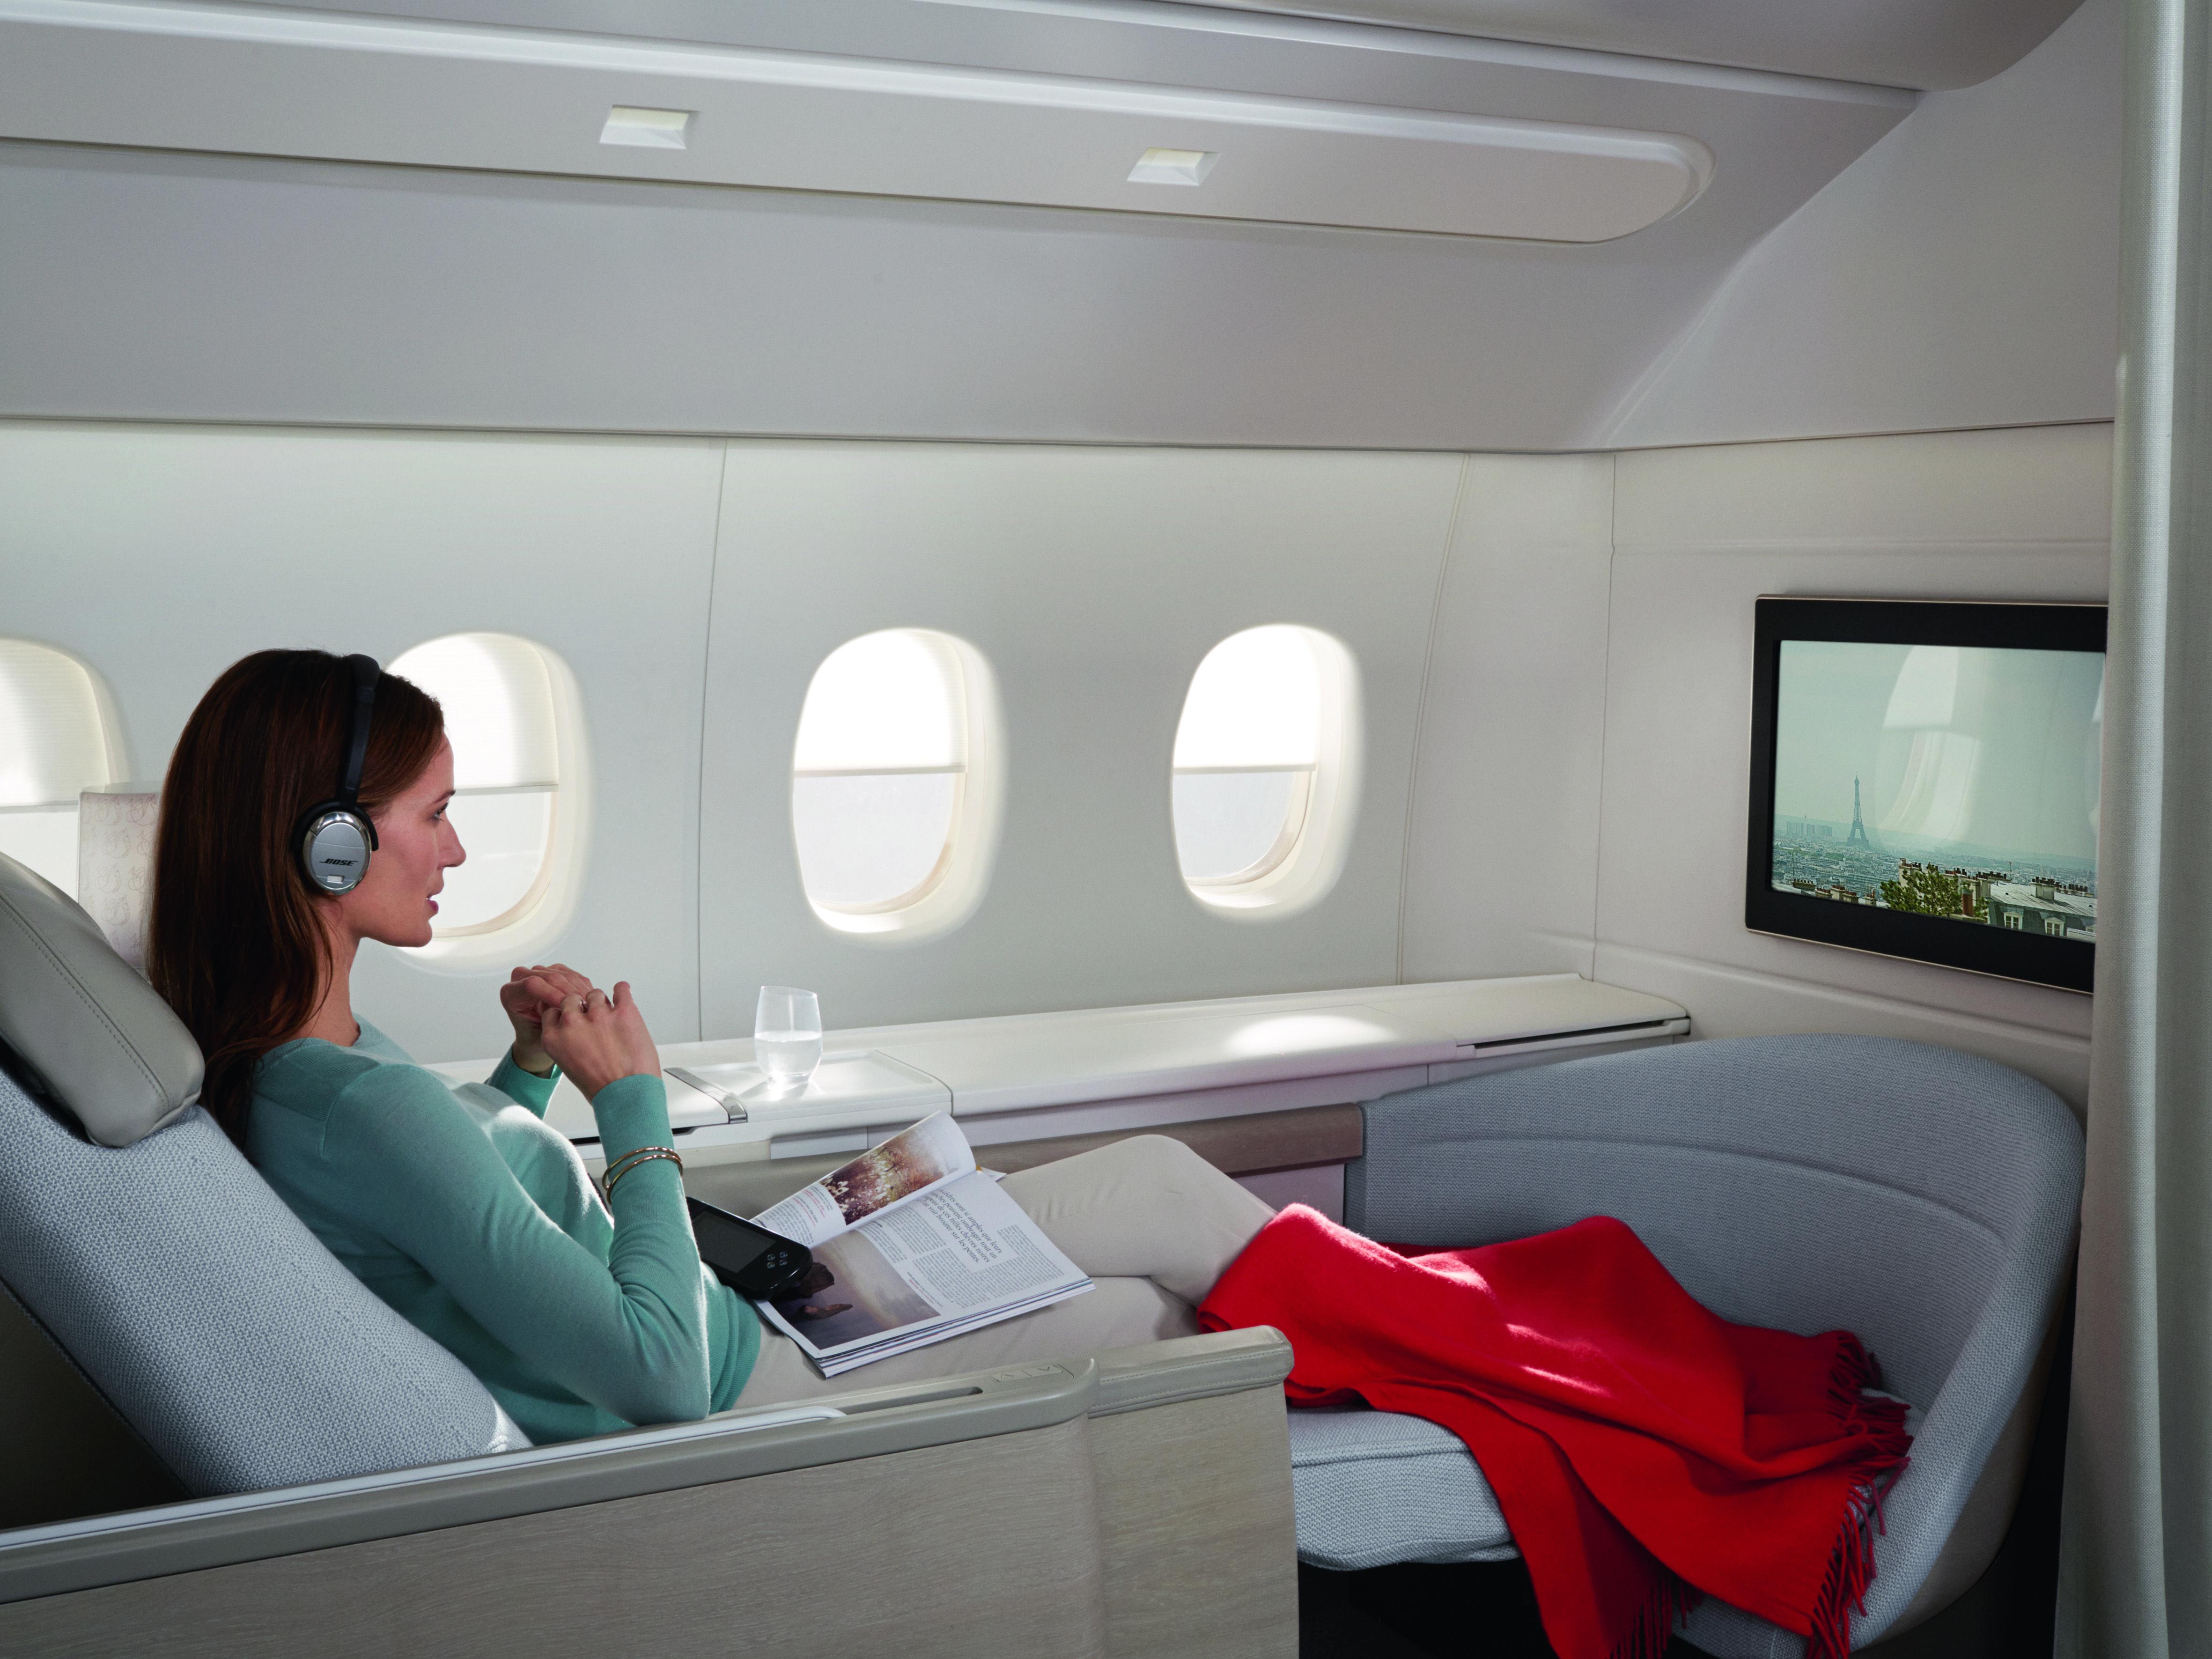 Air France's La Première cabin, composed of 4 private